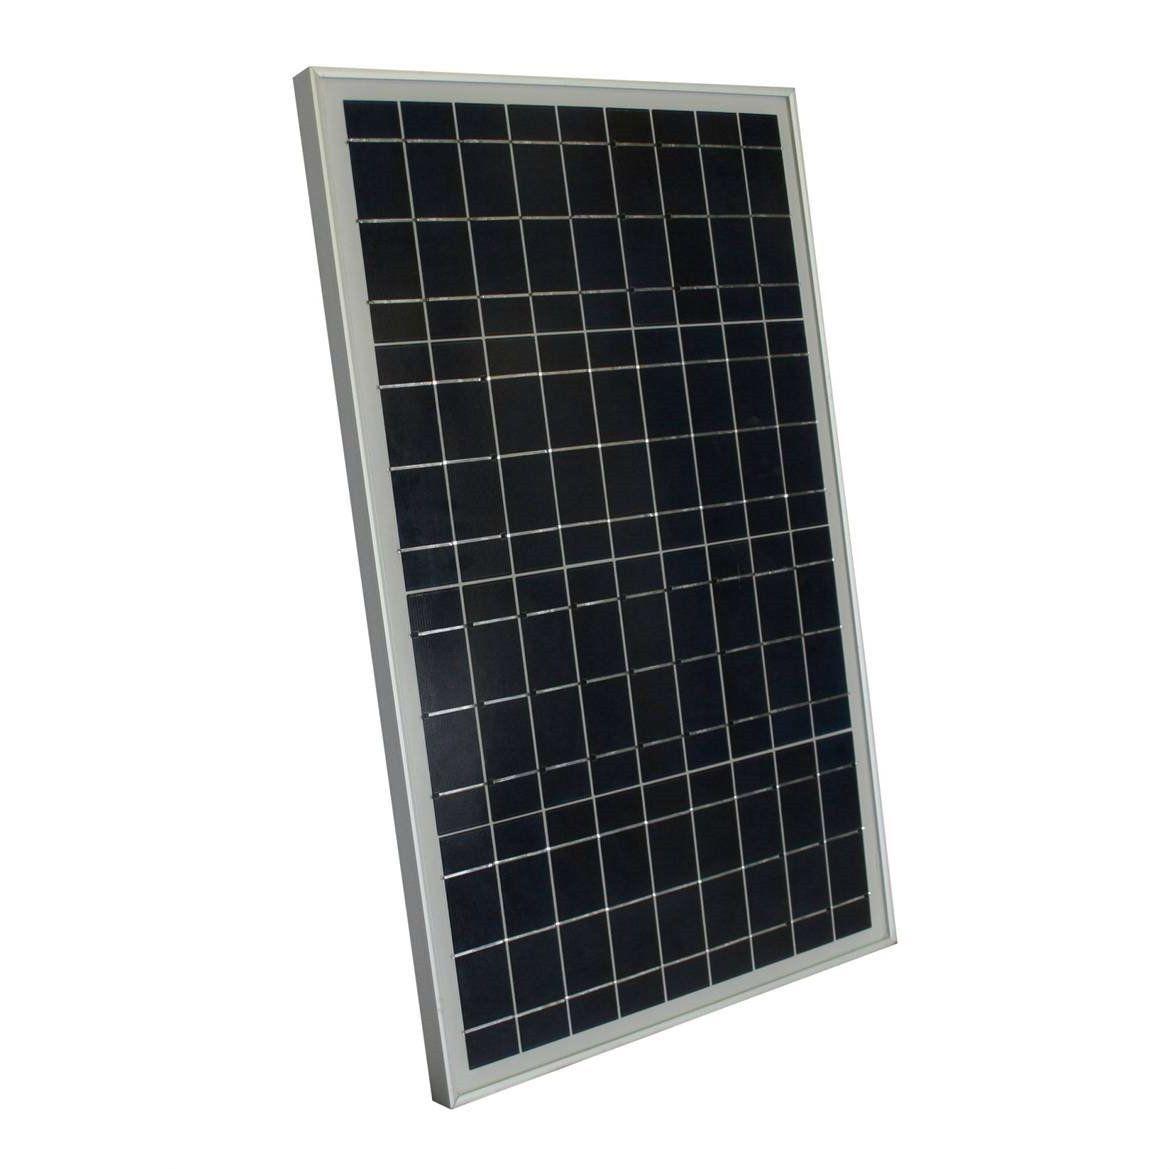 30 Watt Solar Panel 12 Volt Battery Charger For Boat Rv Back Up Off Grid Solar Panels Solar Solar Energy Panels